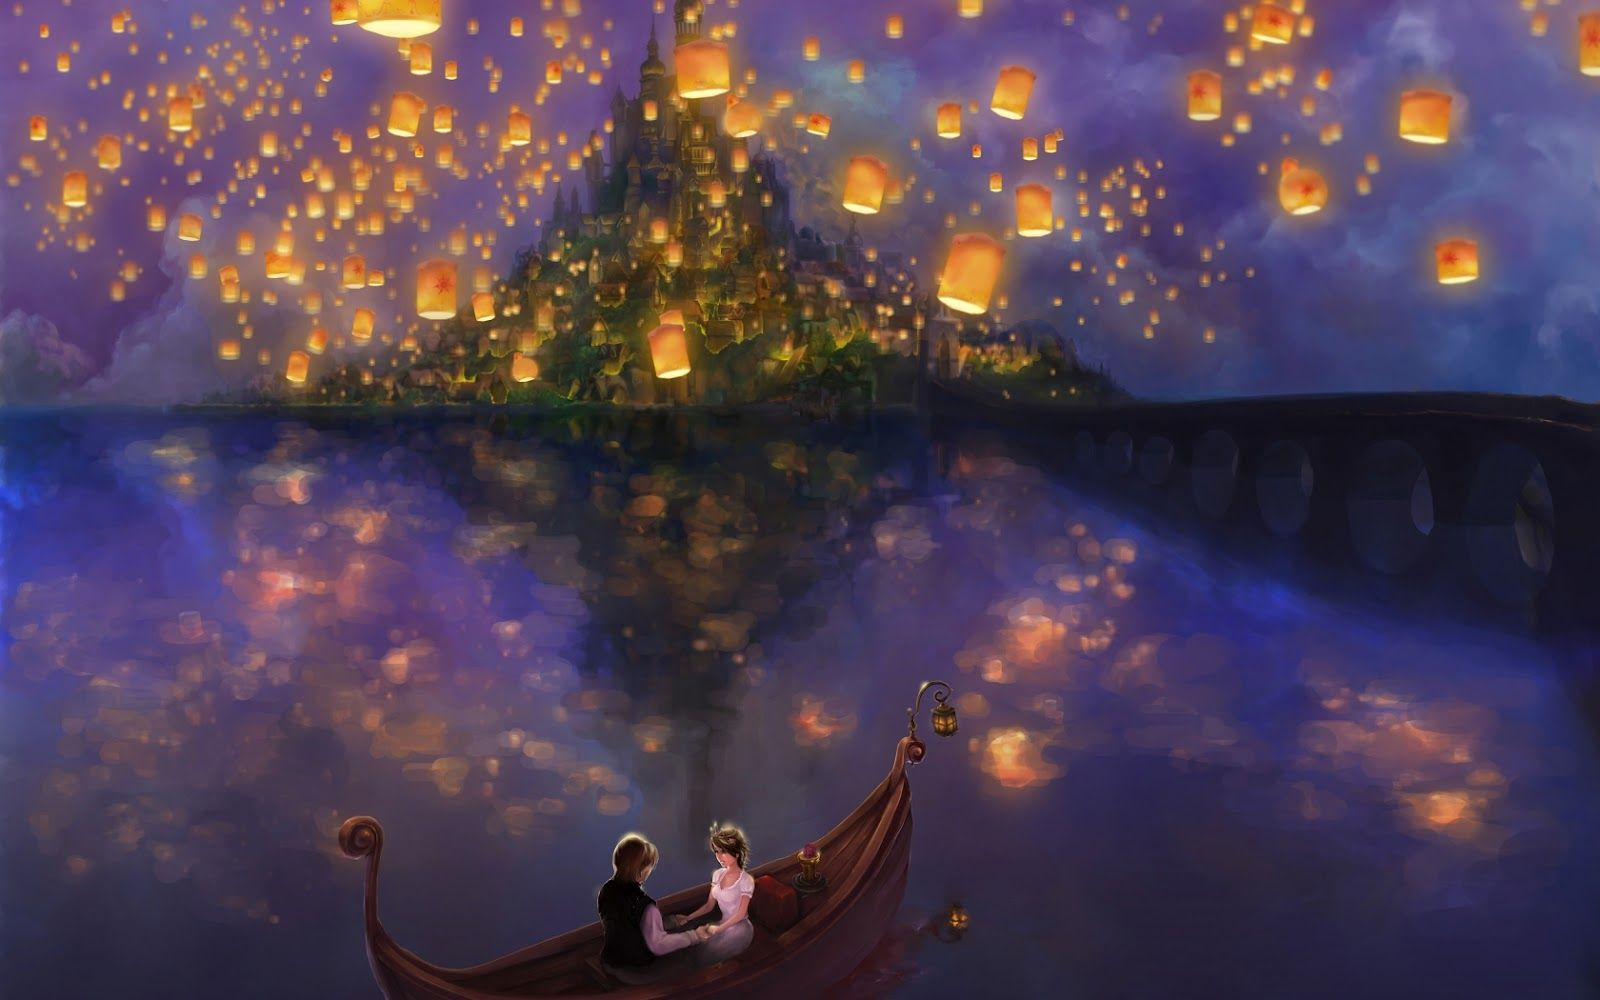 Disney Mac Wallpapers Top Free Disney Mac Backgrounds Wallpaperaccess